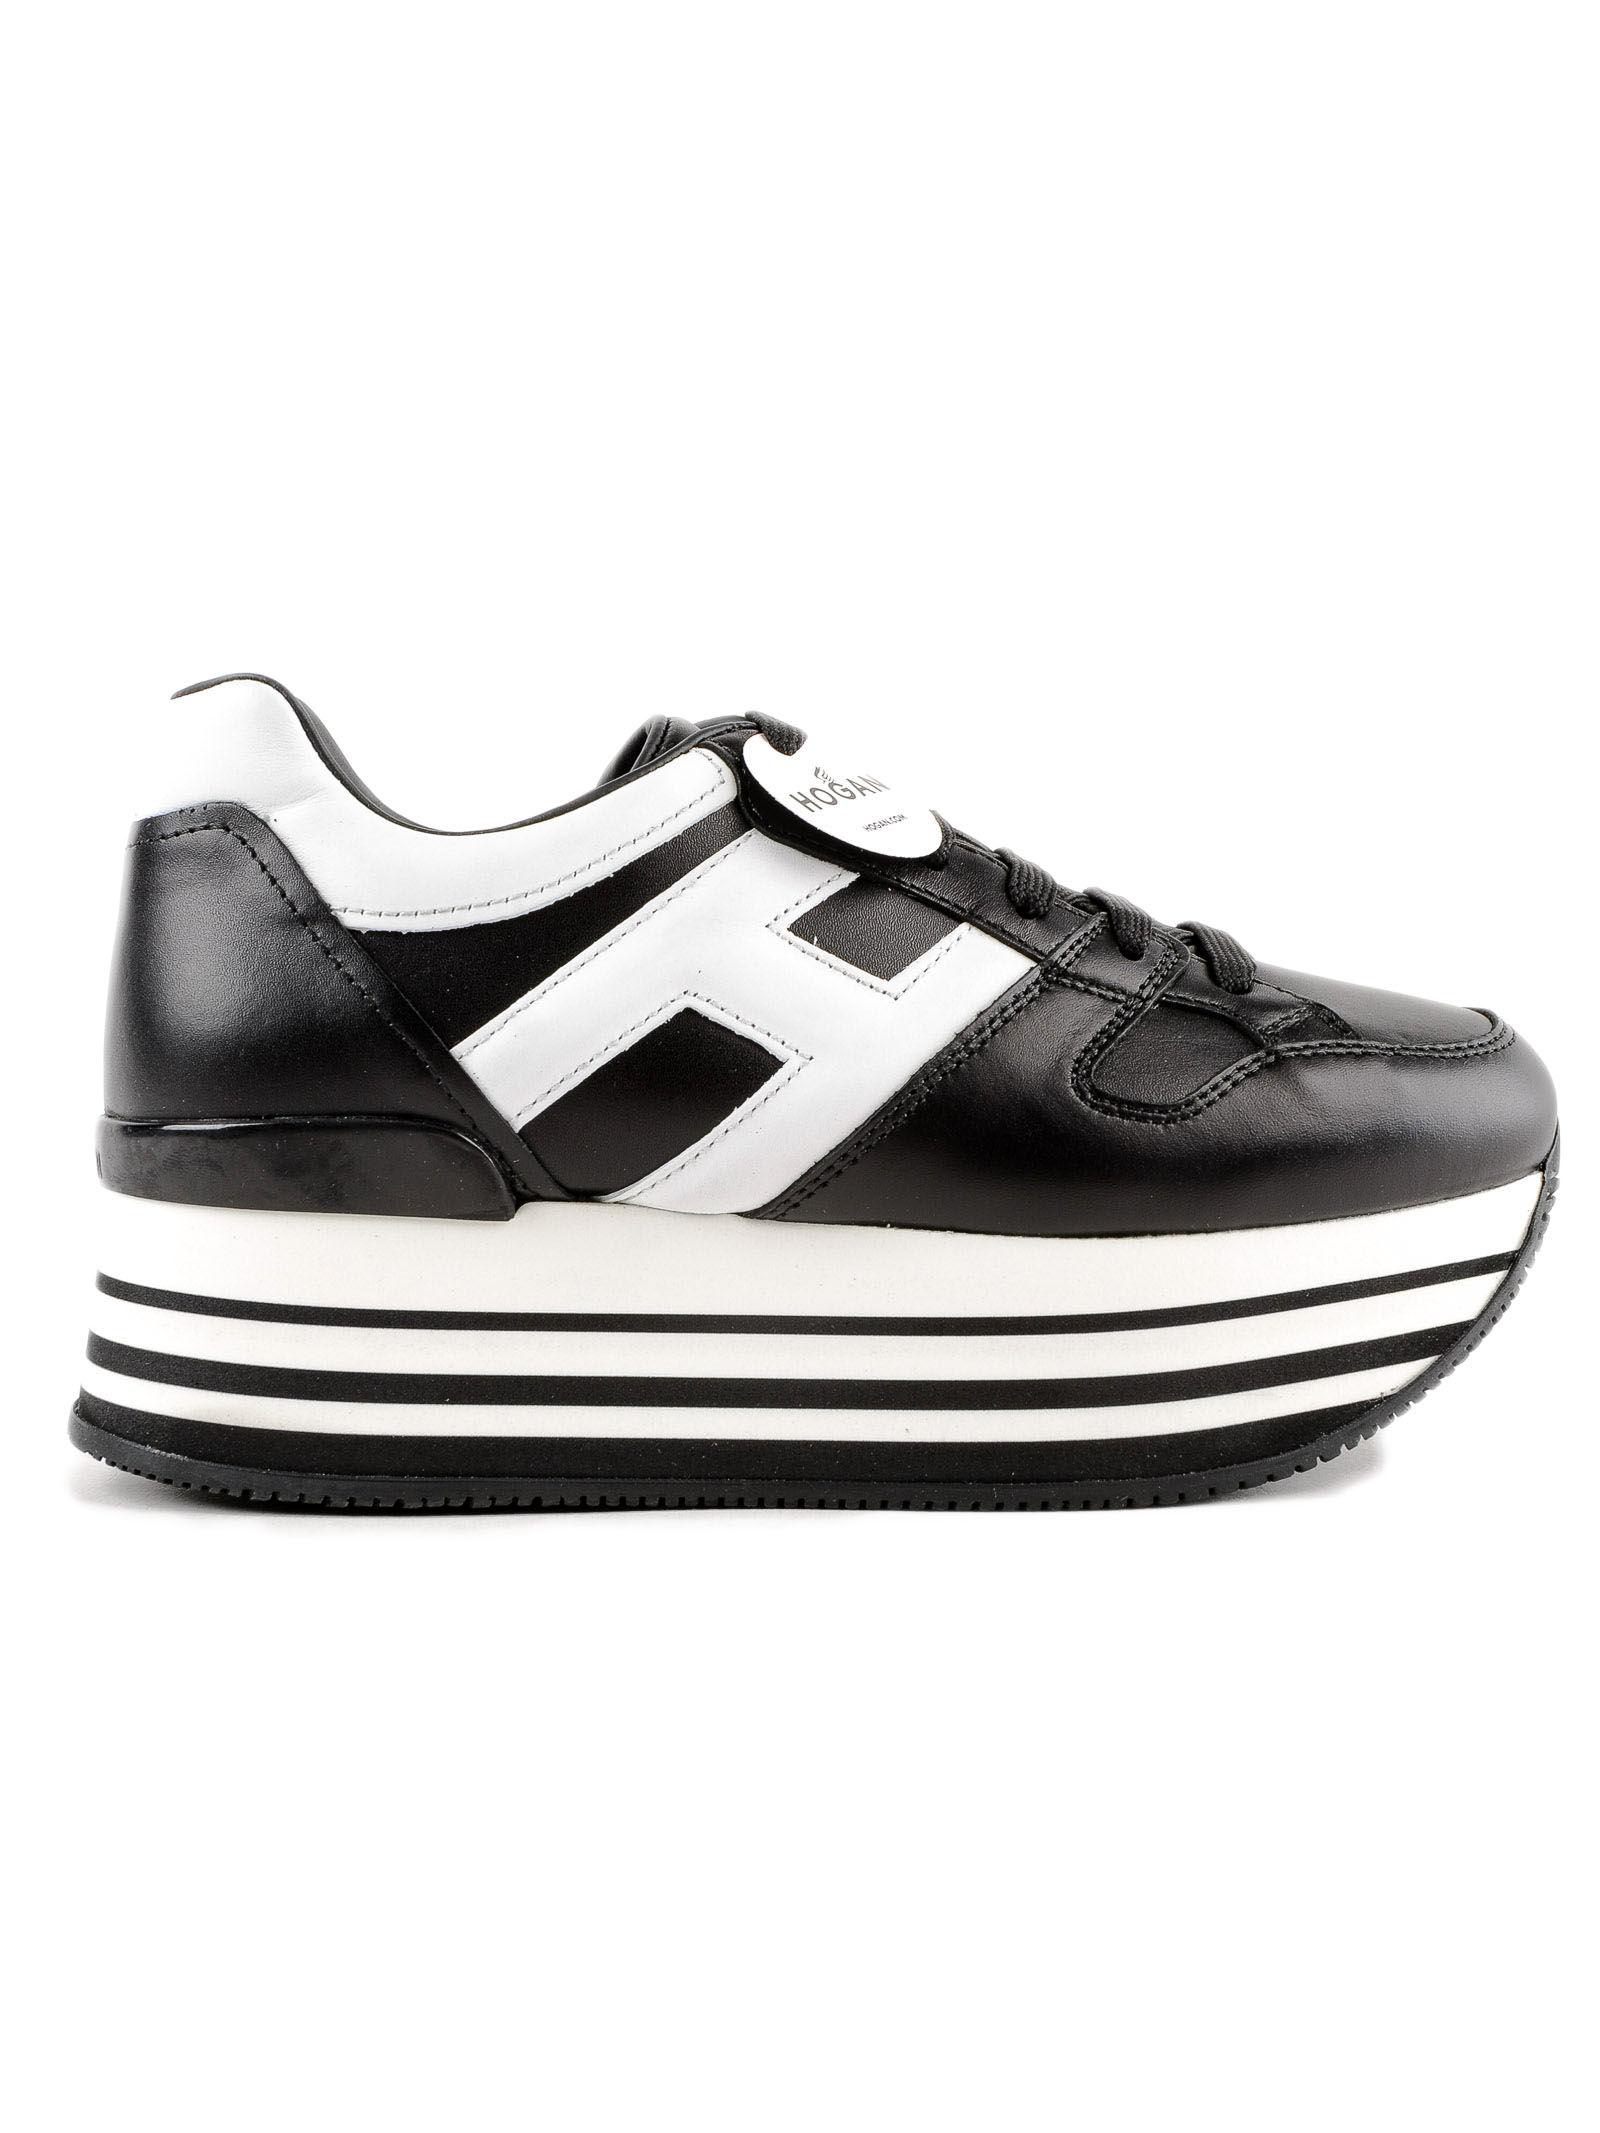 Shop Hogan Maxi H222厚底运动鞋 In Black/white